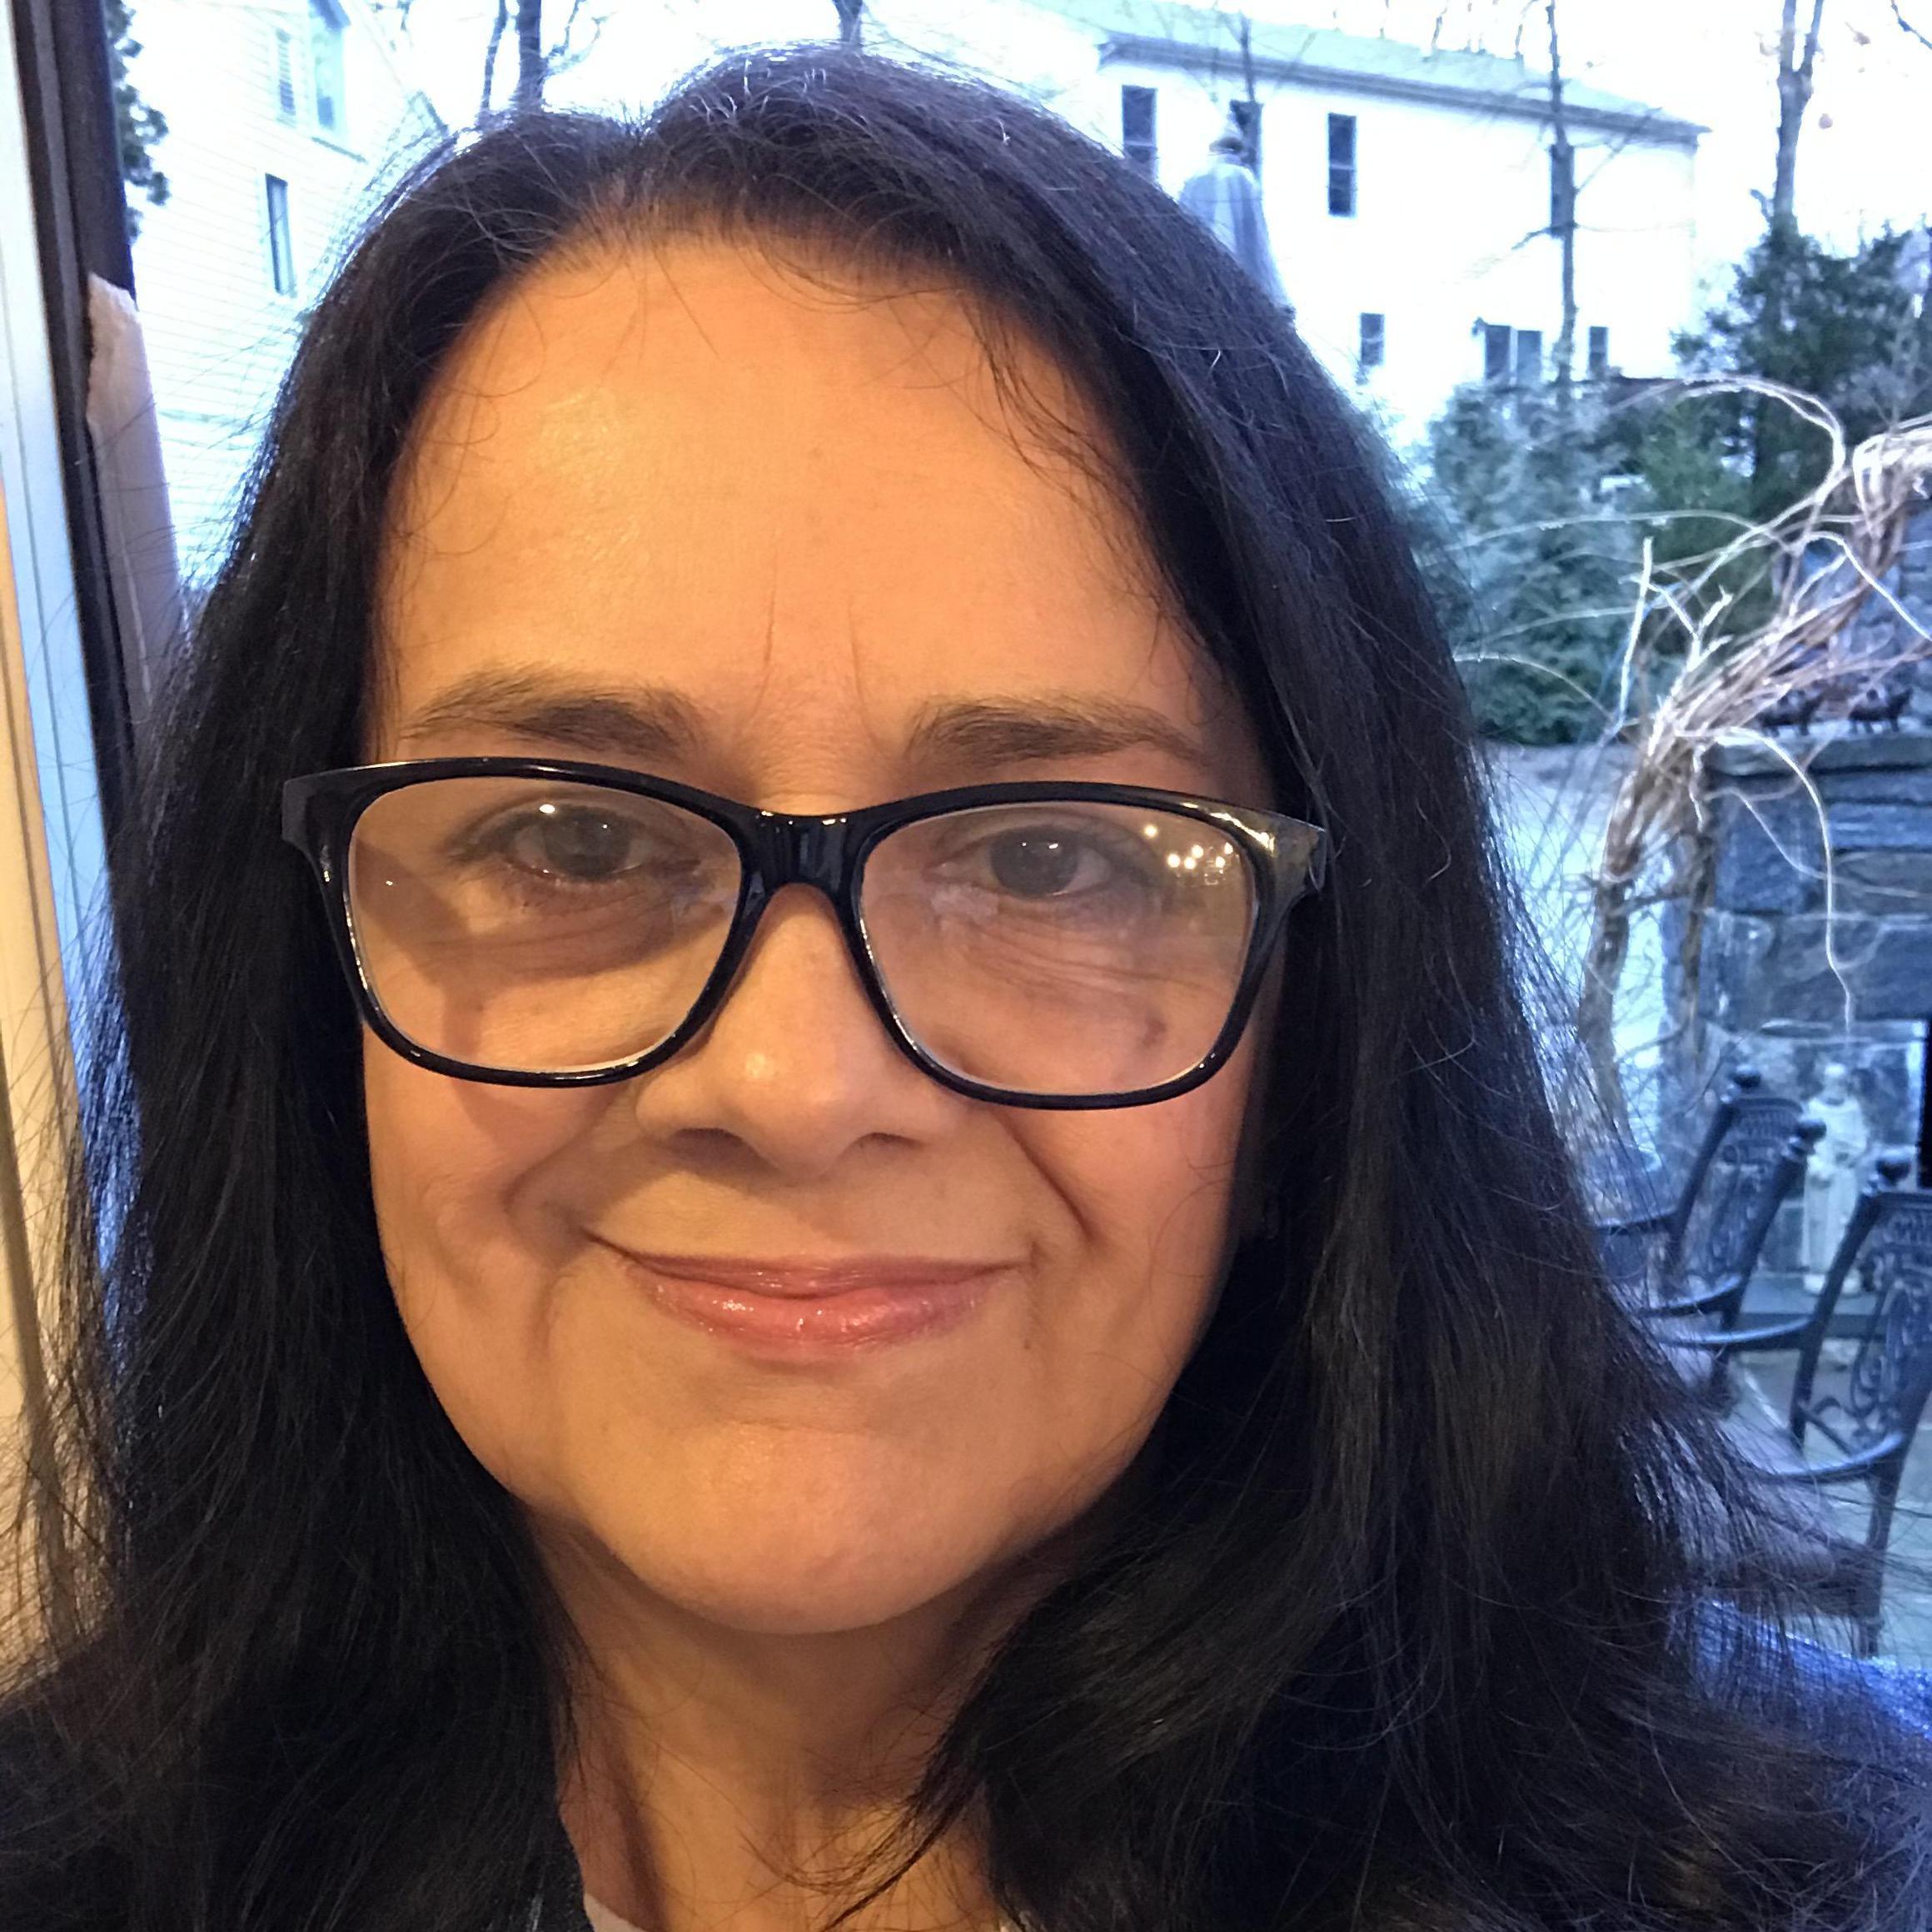 Kattia Salazar's Profile Photo